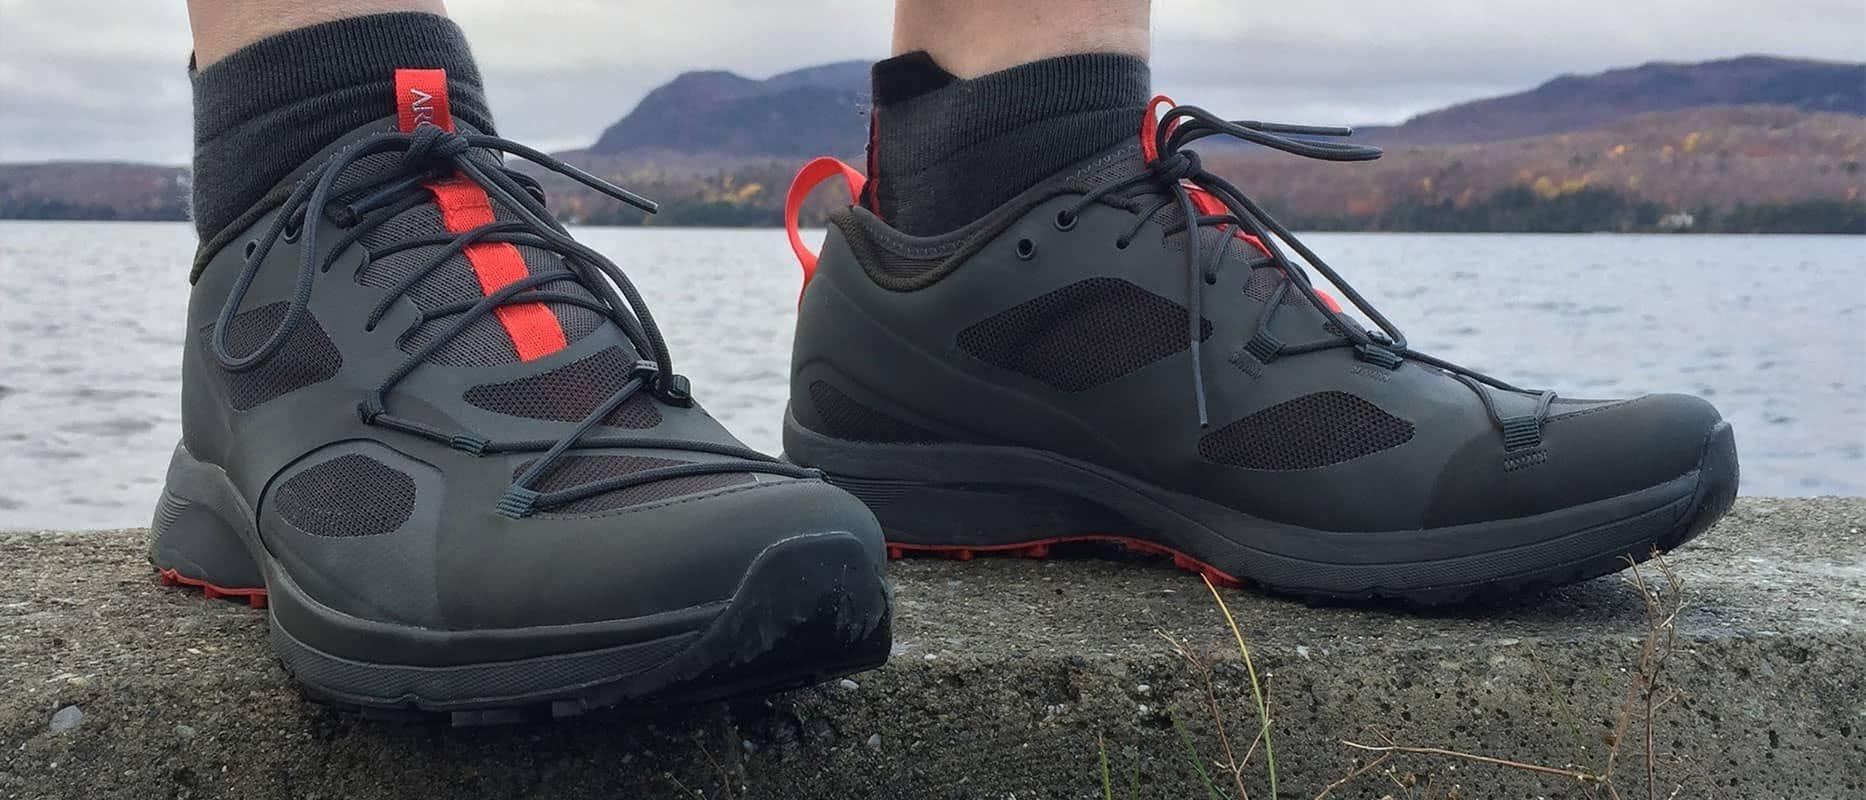 Arc'teryx, Running. Arc'teryx's First Ever Trail Running Shoe: The Norvan VT & Norvan VT GTX